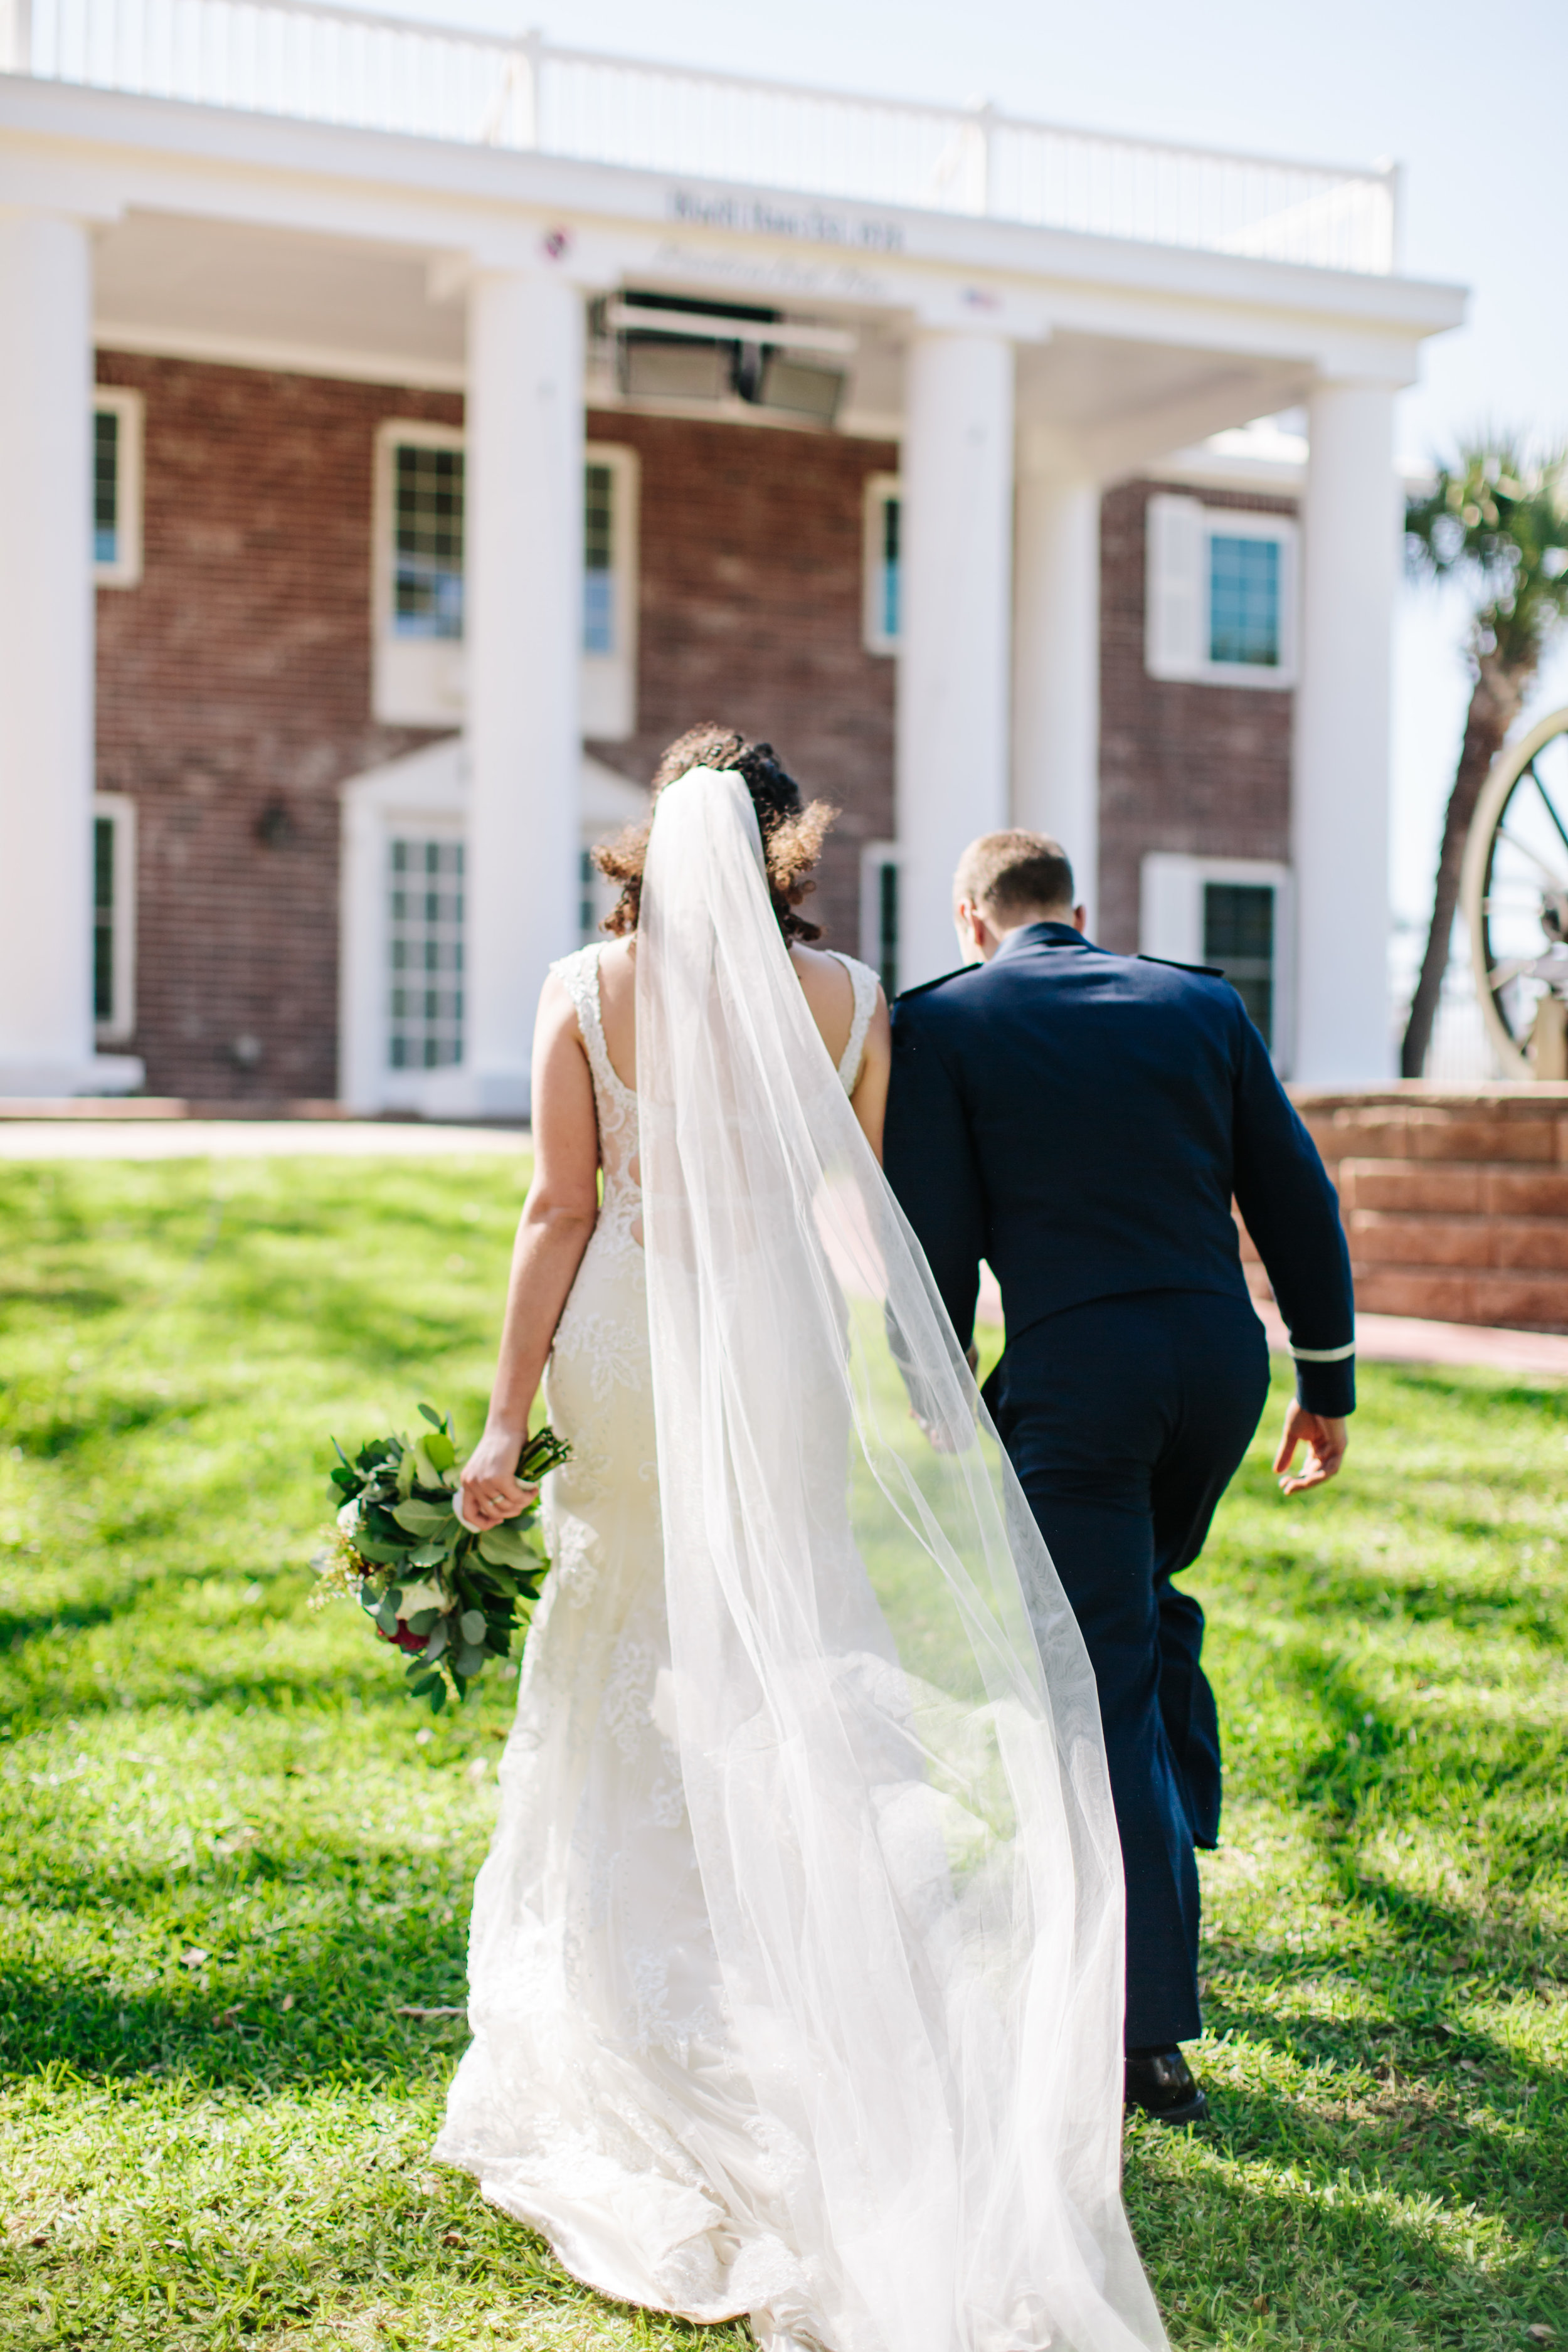 2018.03.17 Allison and Chuck Wedding Waelti Melbourne (383 of 569).jpg